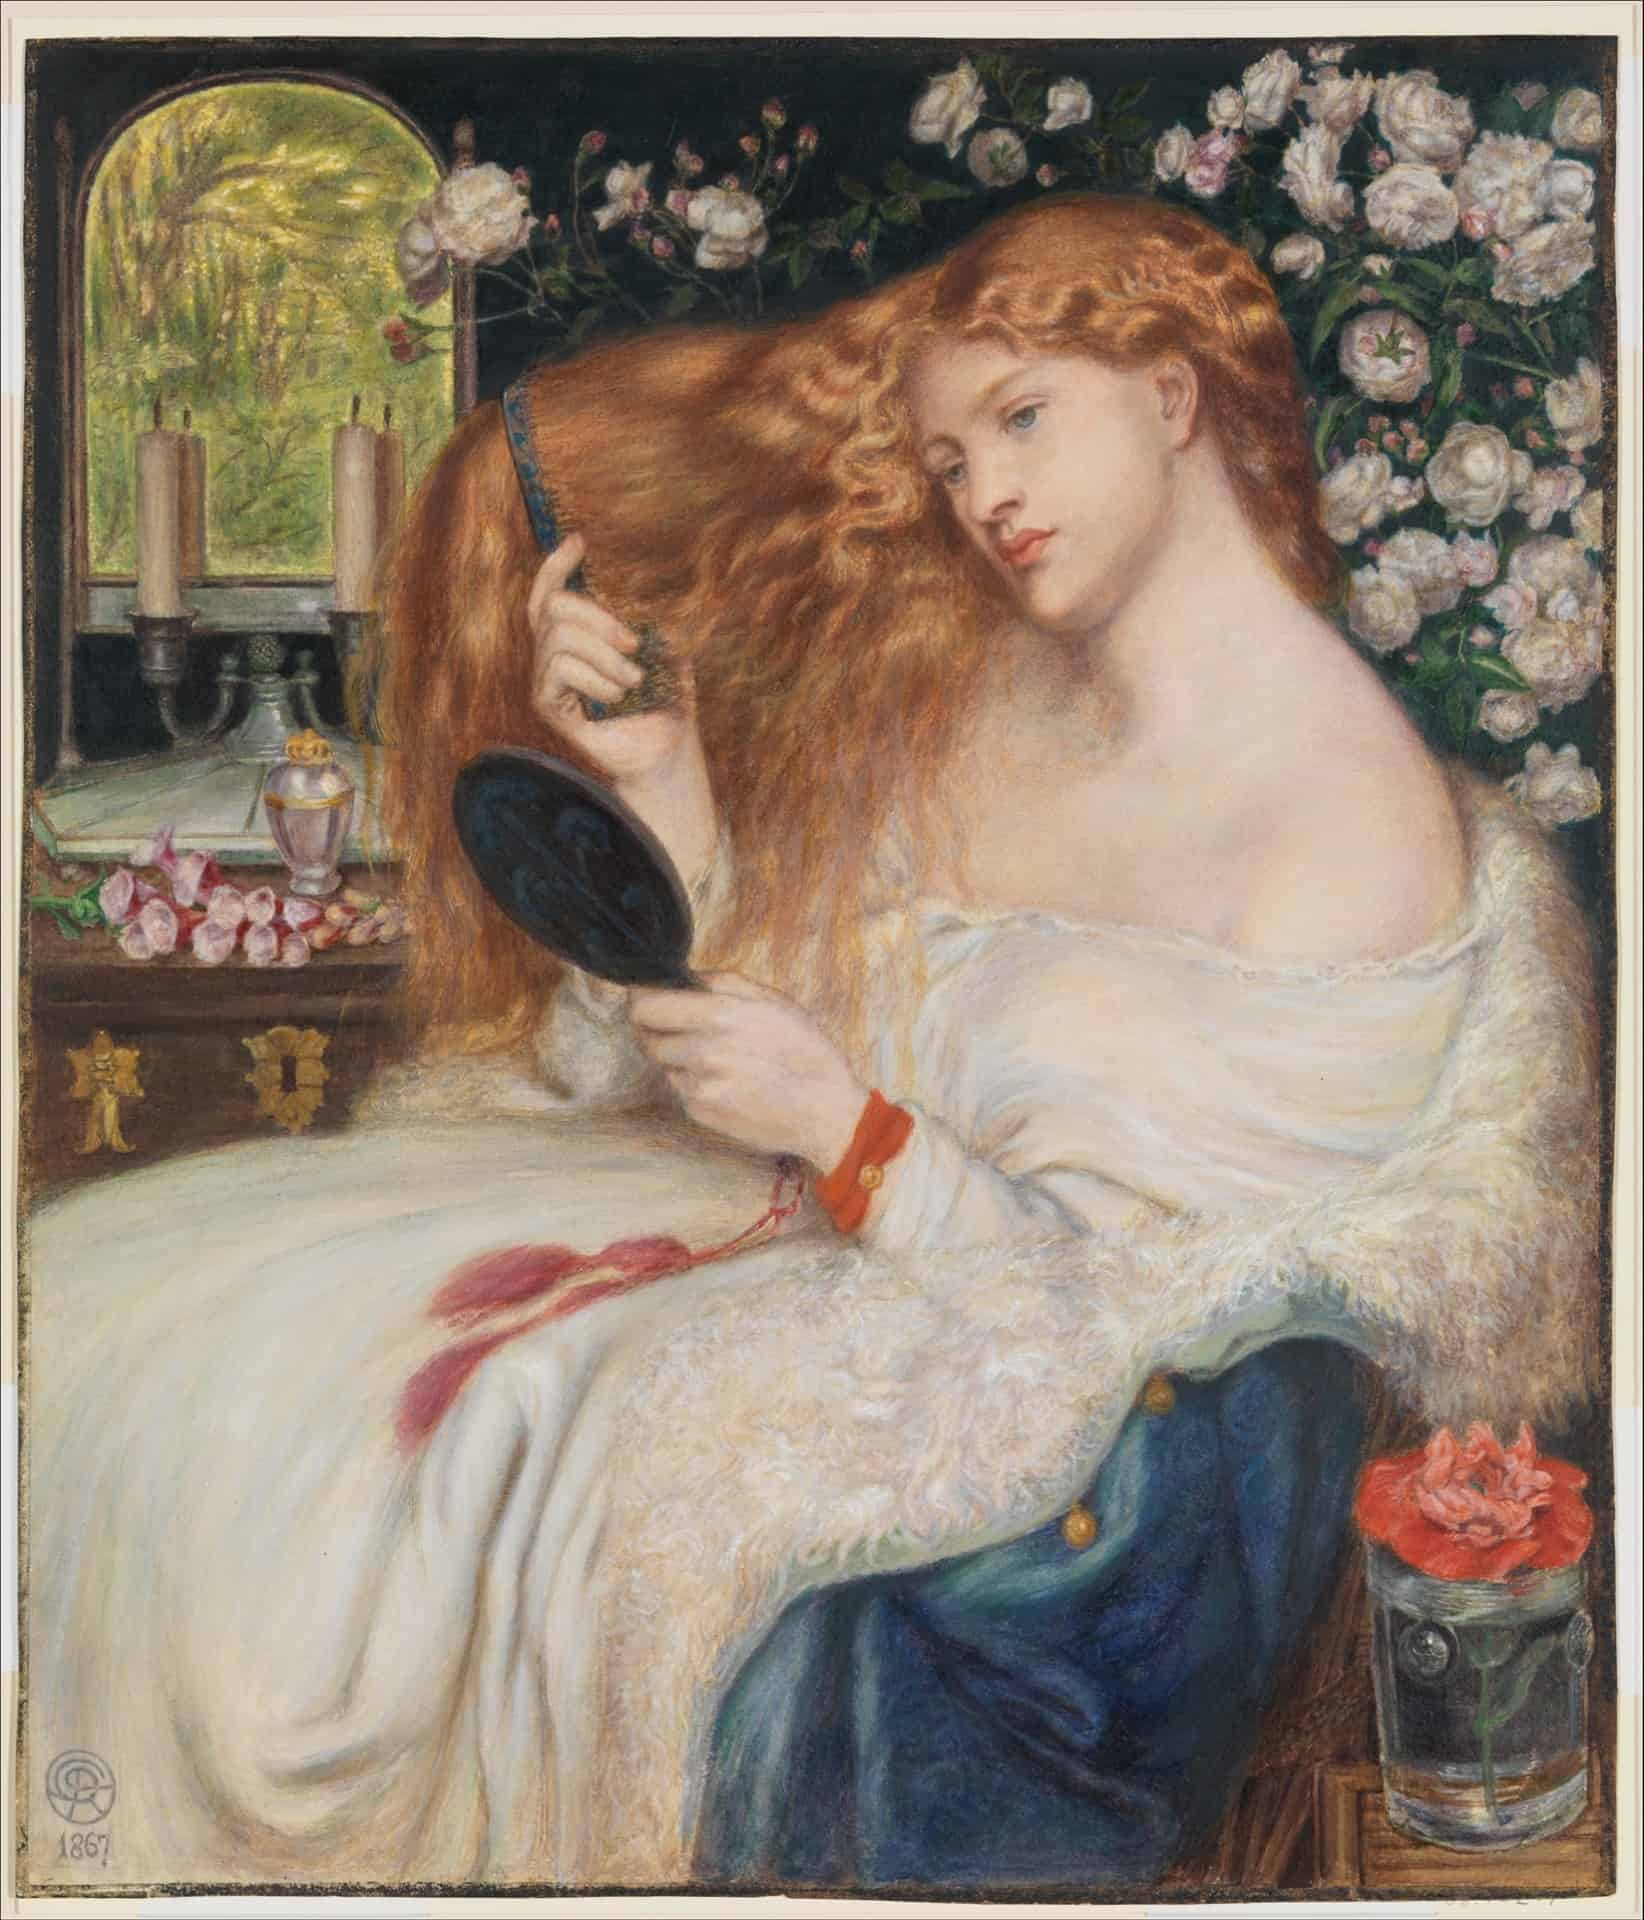 19th century painters